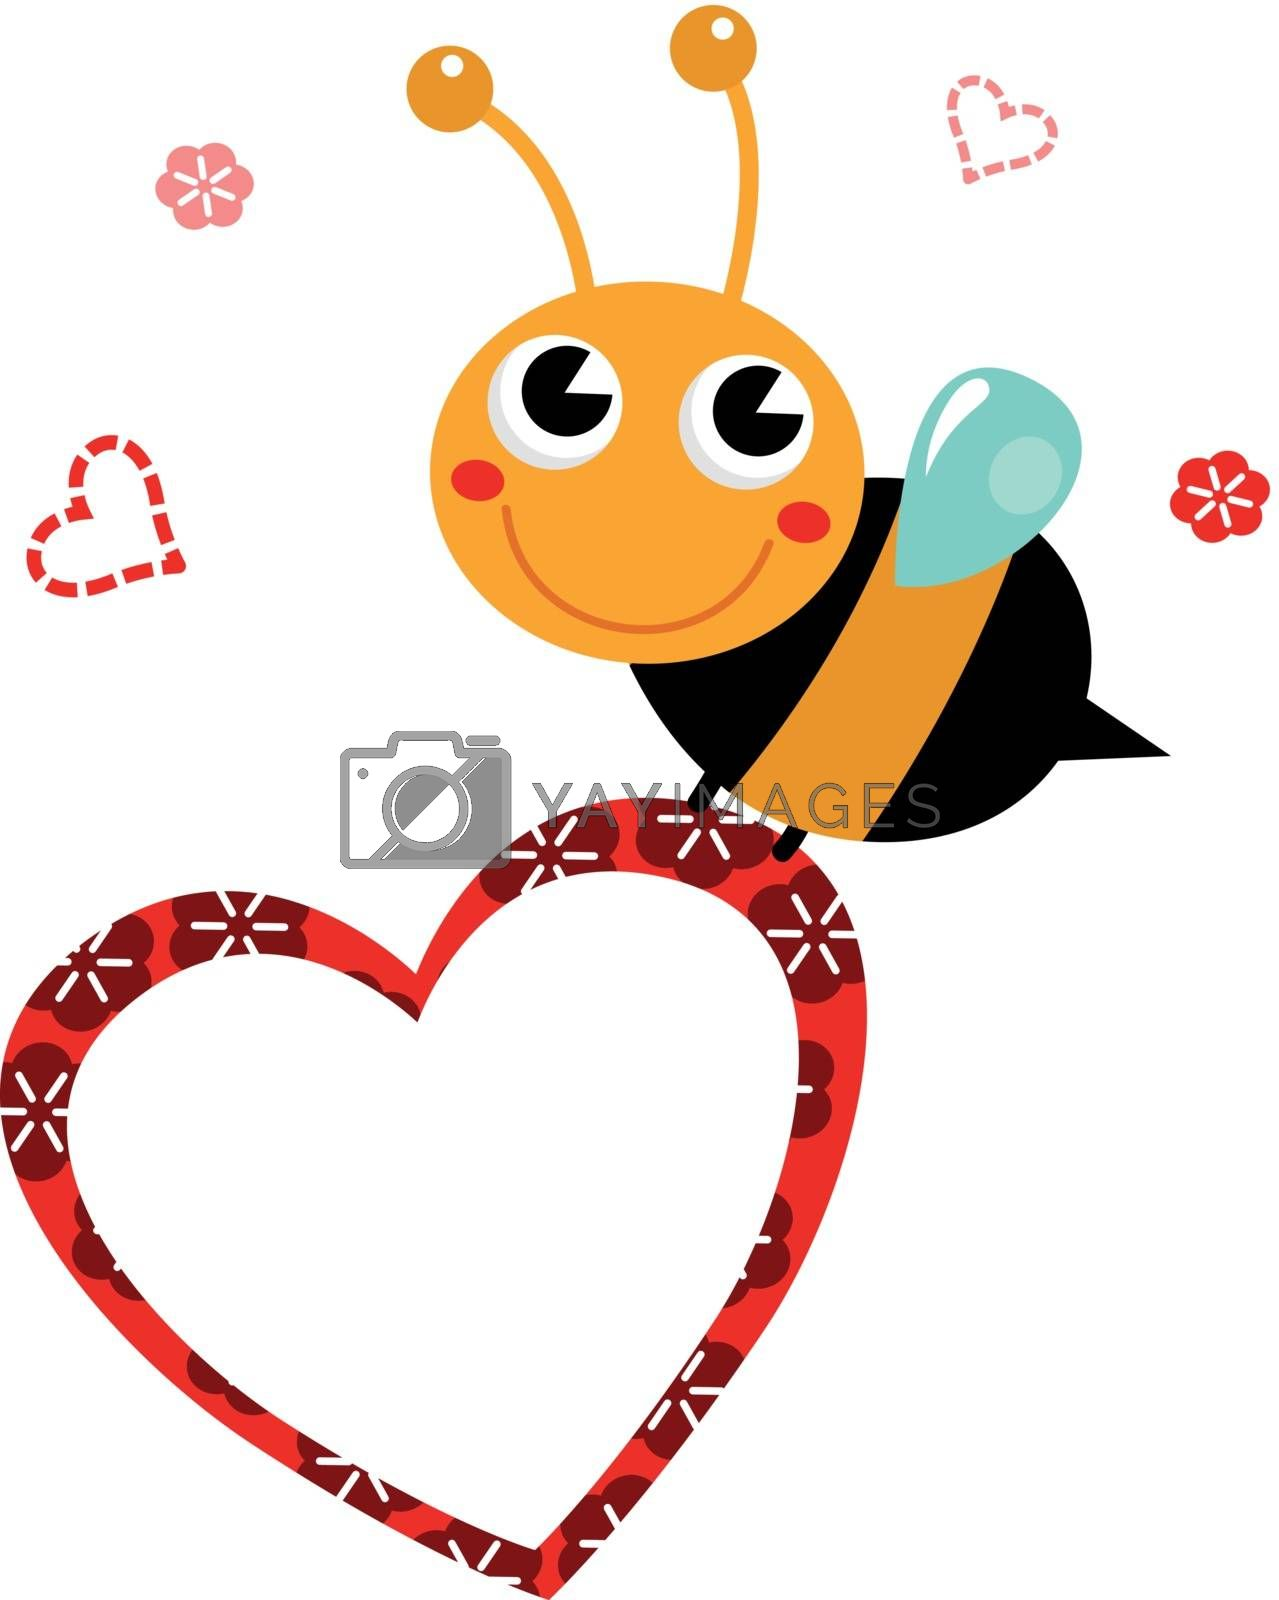 Adorable cartoon Bee holding heart. Vector Illustration in retro style